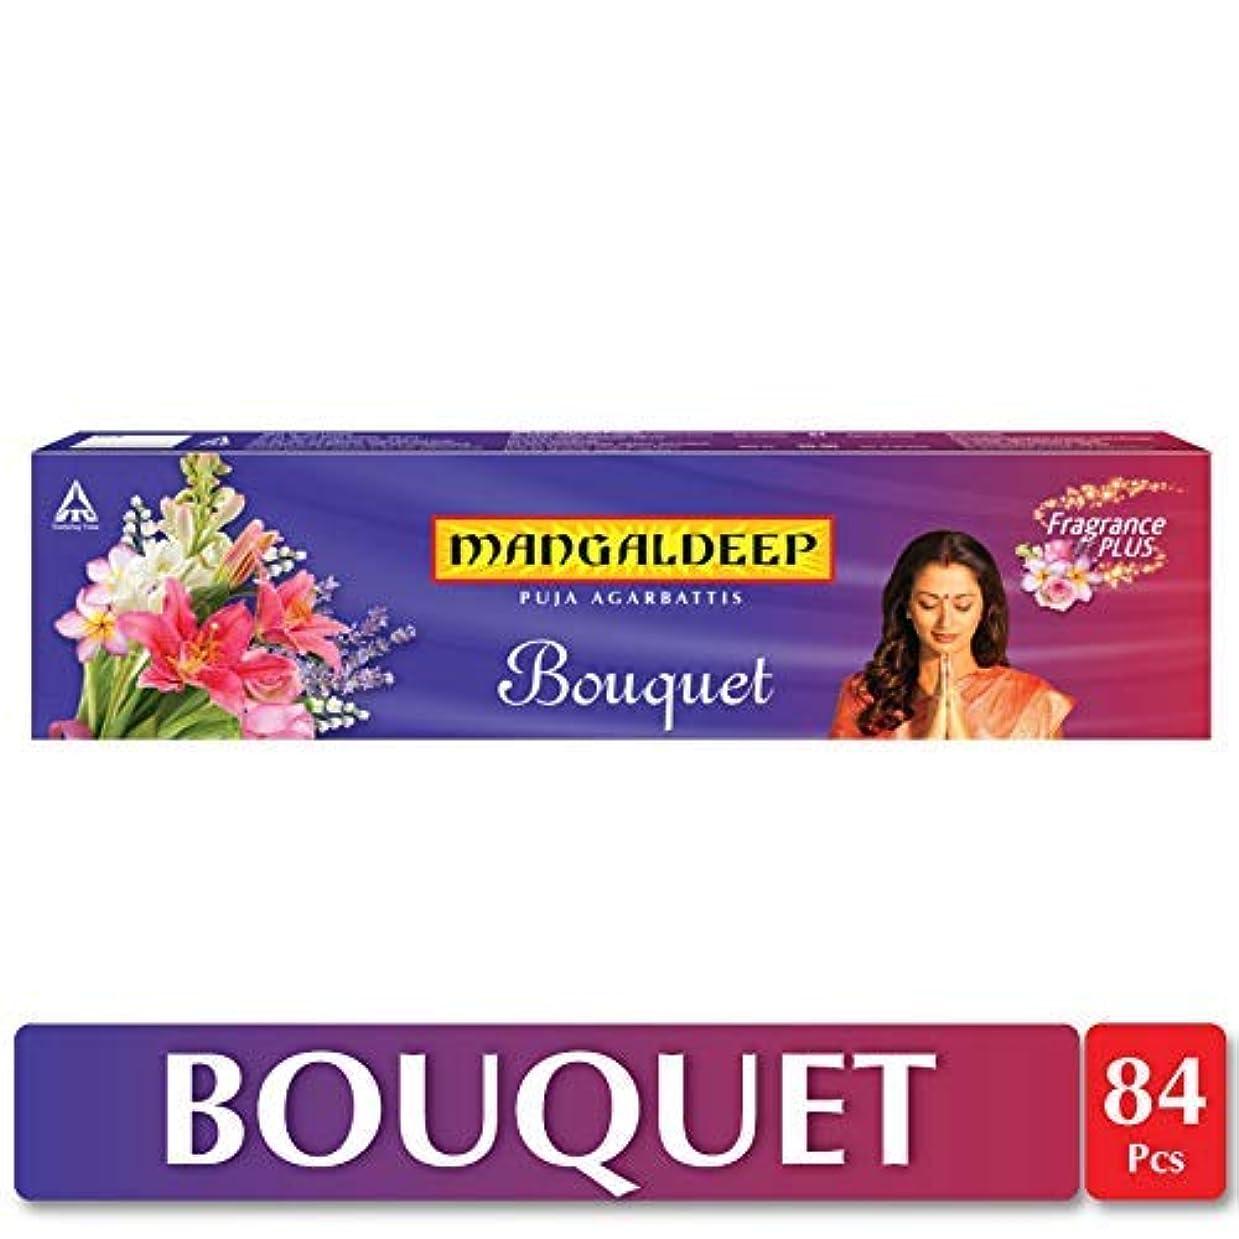 墓地流産壊滅的なMangaldeep Bouquet Agarbatti 84 Sticks